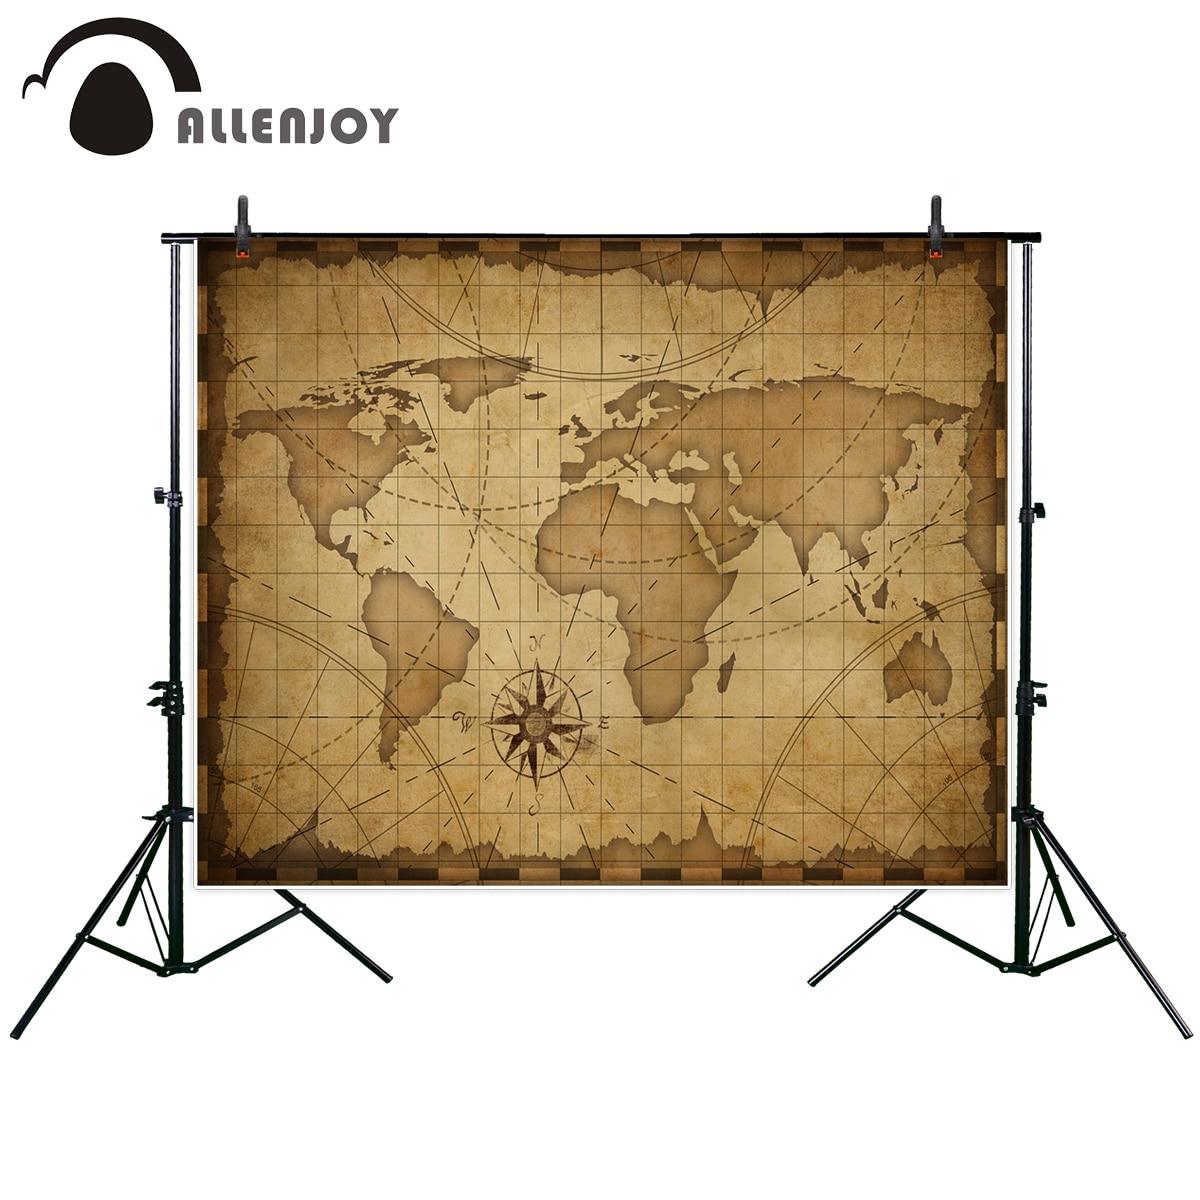 Big Sale Allenjoy Photographic Background Map Navigation Ancient Sinski Wiring Diagram World Travel Customization New Backdrop Photocall Photo Printed Custom